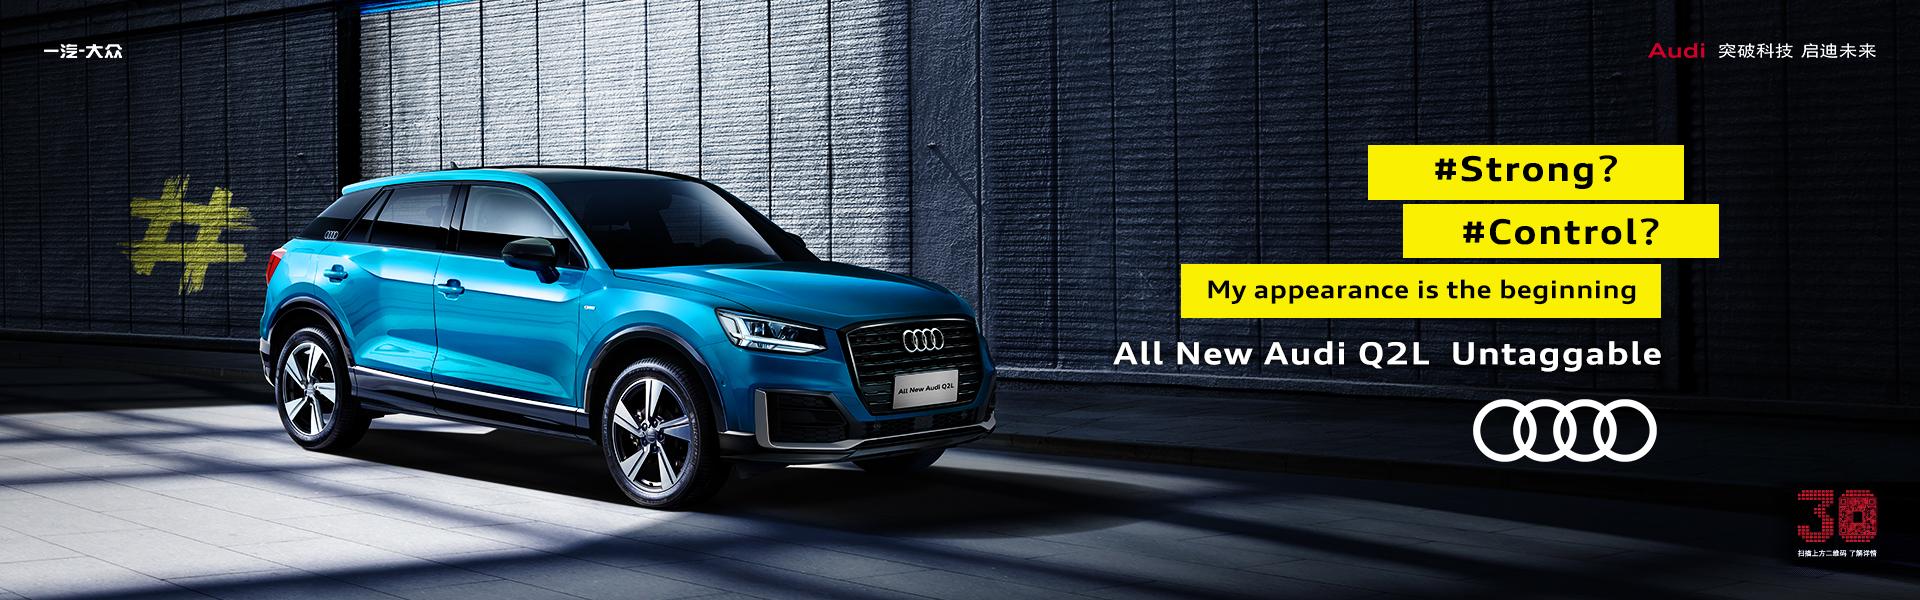 FAWVolkswagen AudiVorsprung Durch Technik - Audi home